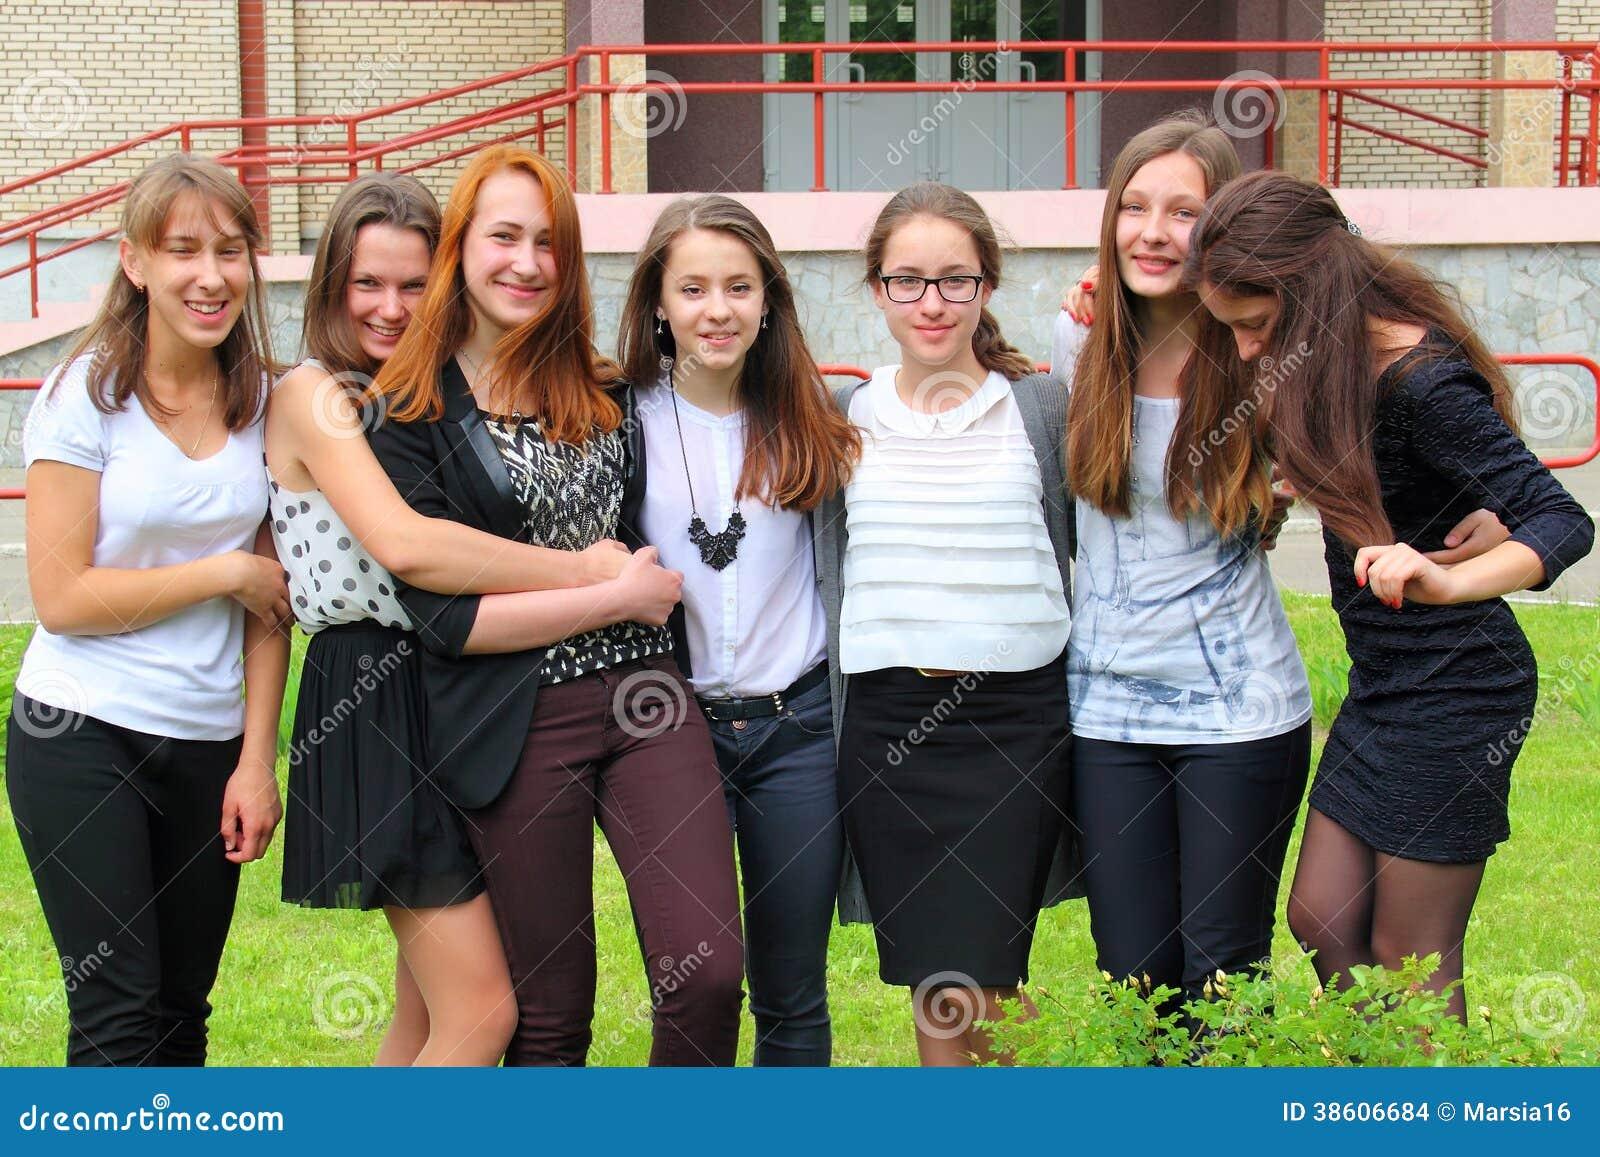 Parte dianteira de sorriso dos adolescentes da escola